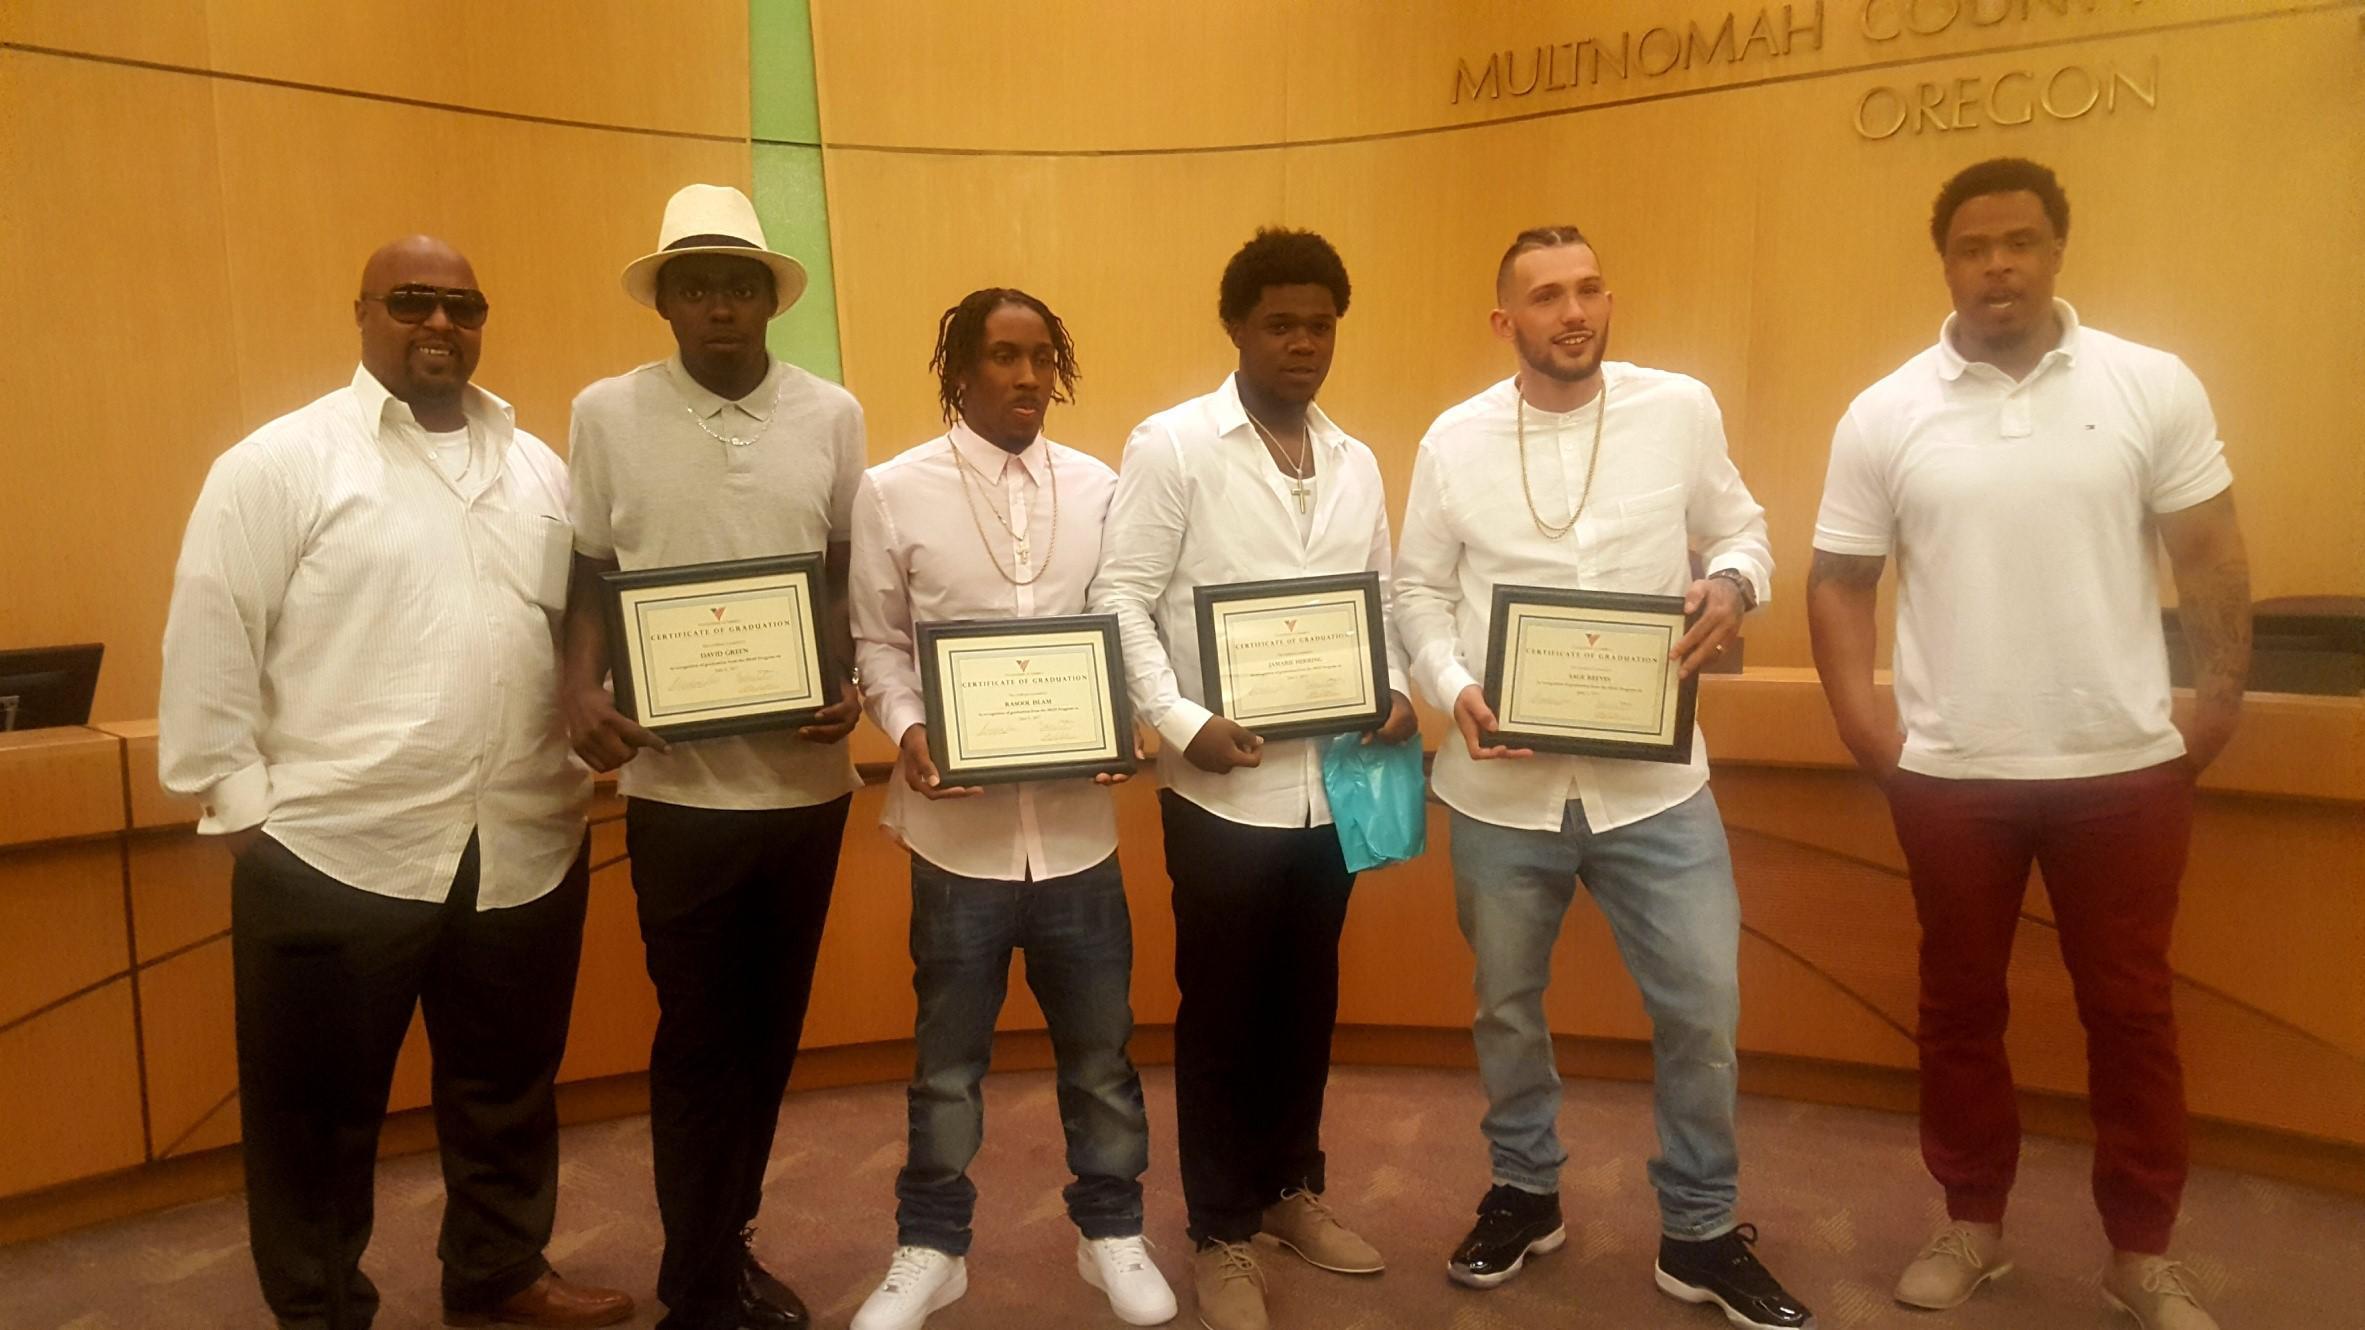 CPR graduates holding certificates